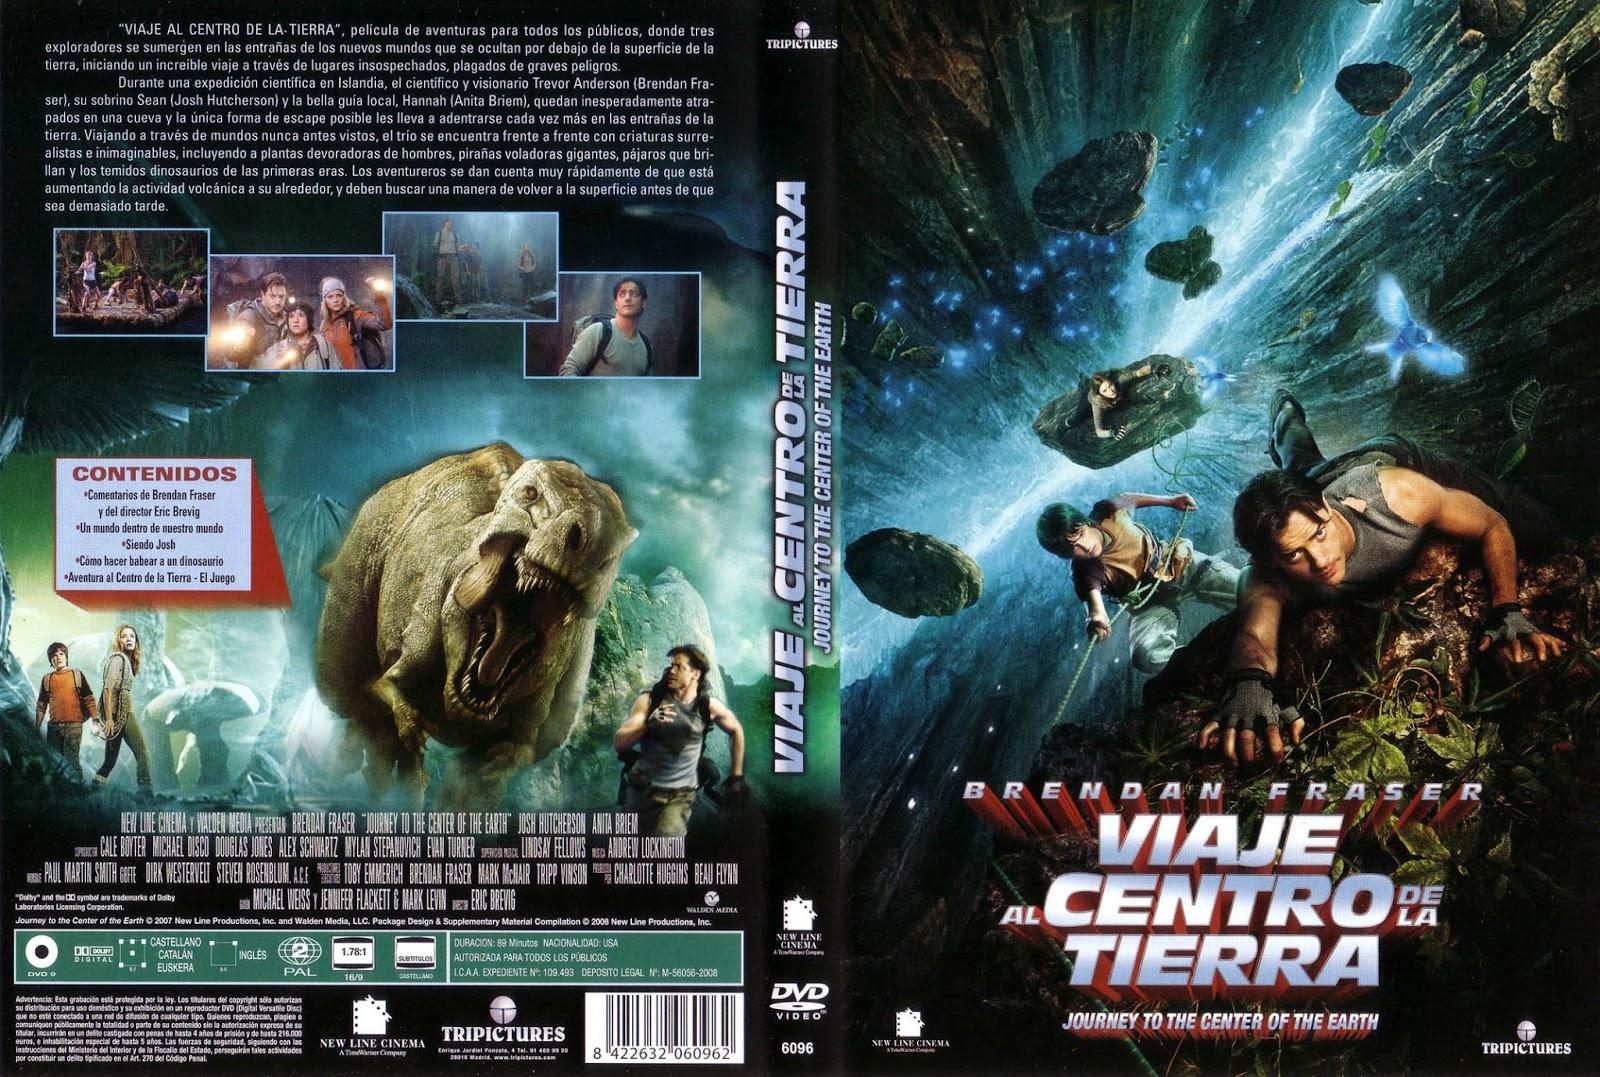 Viaje Al Centro De La Tierra DVD